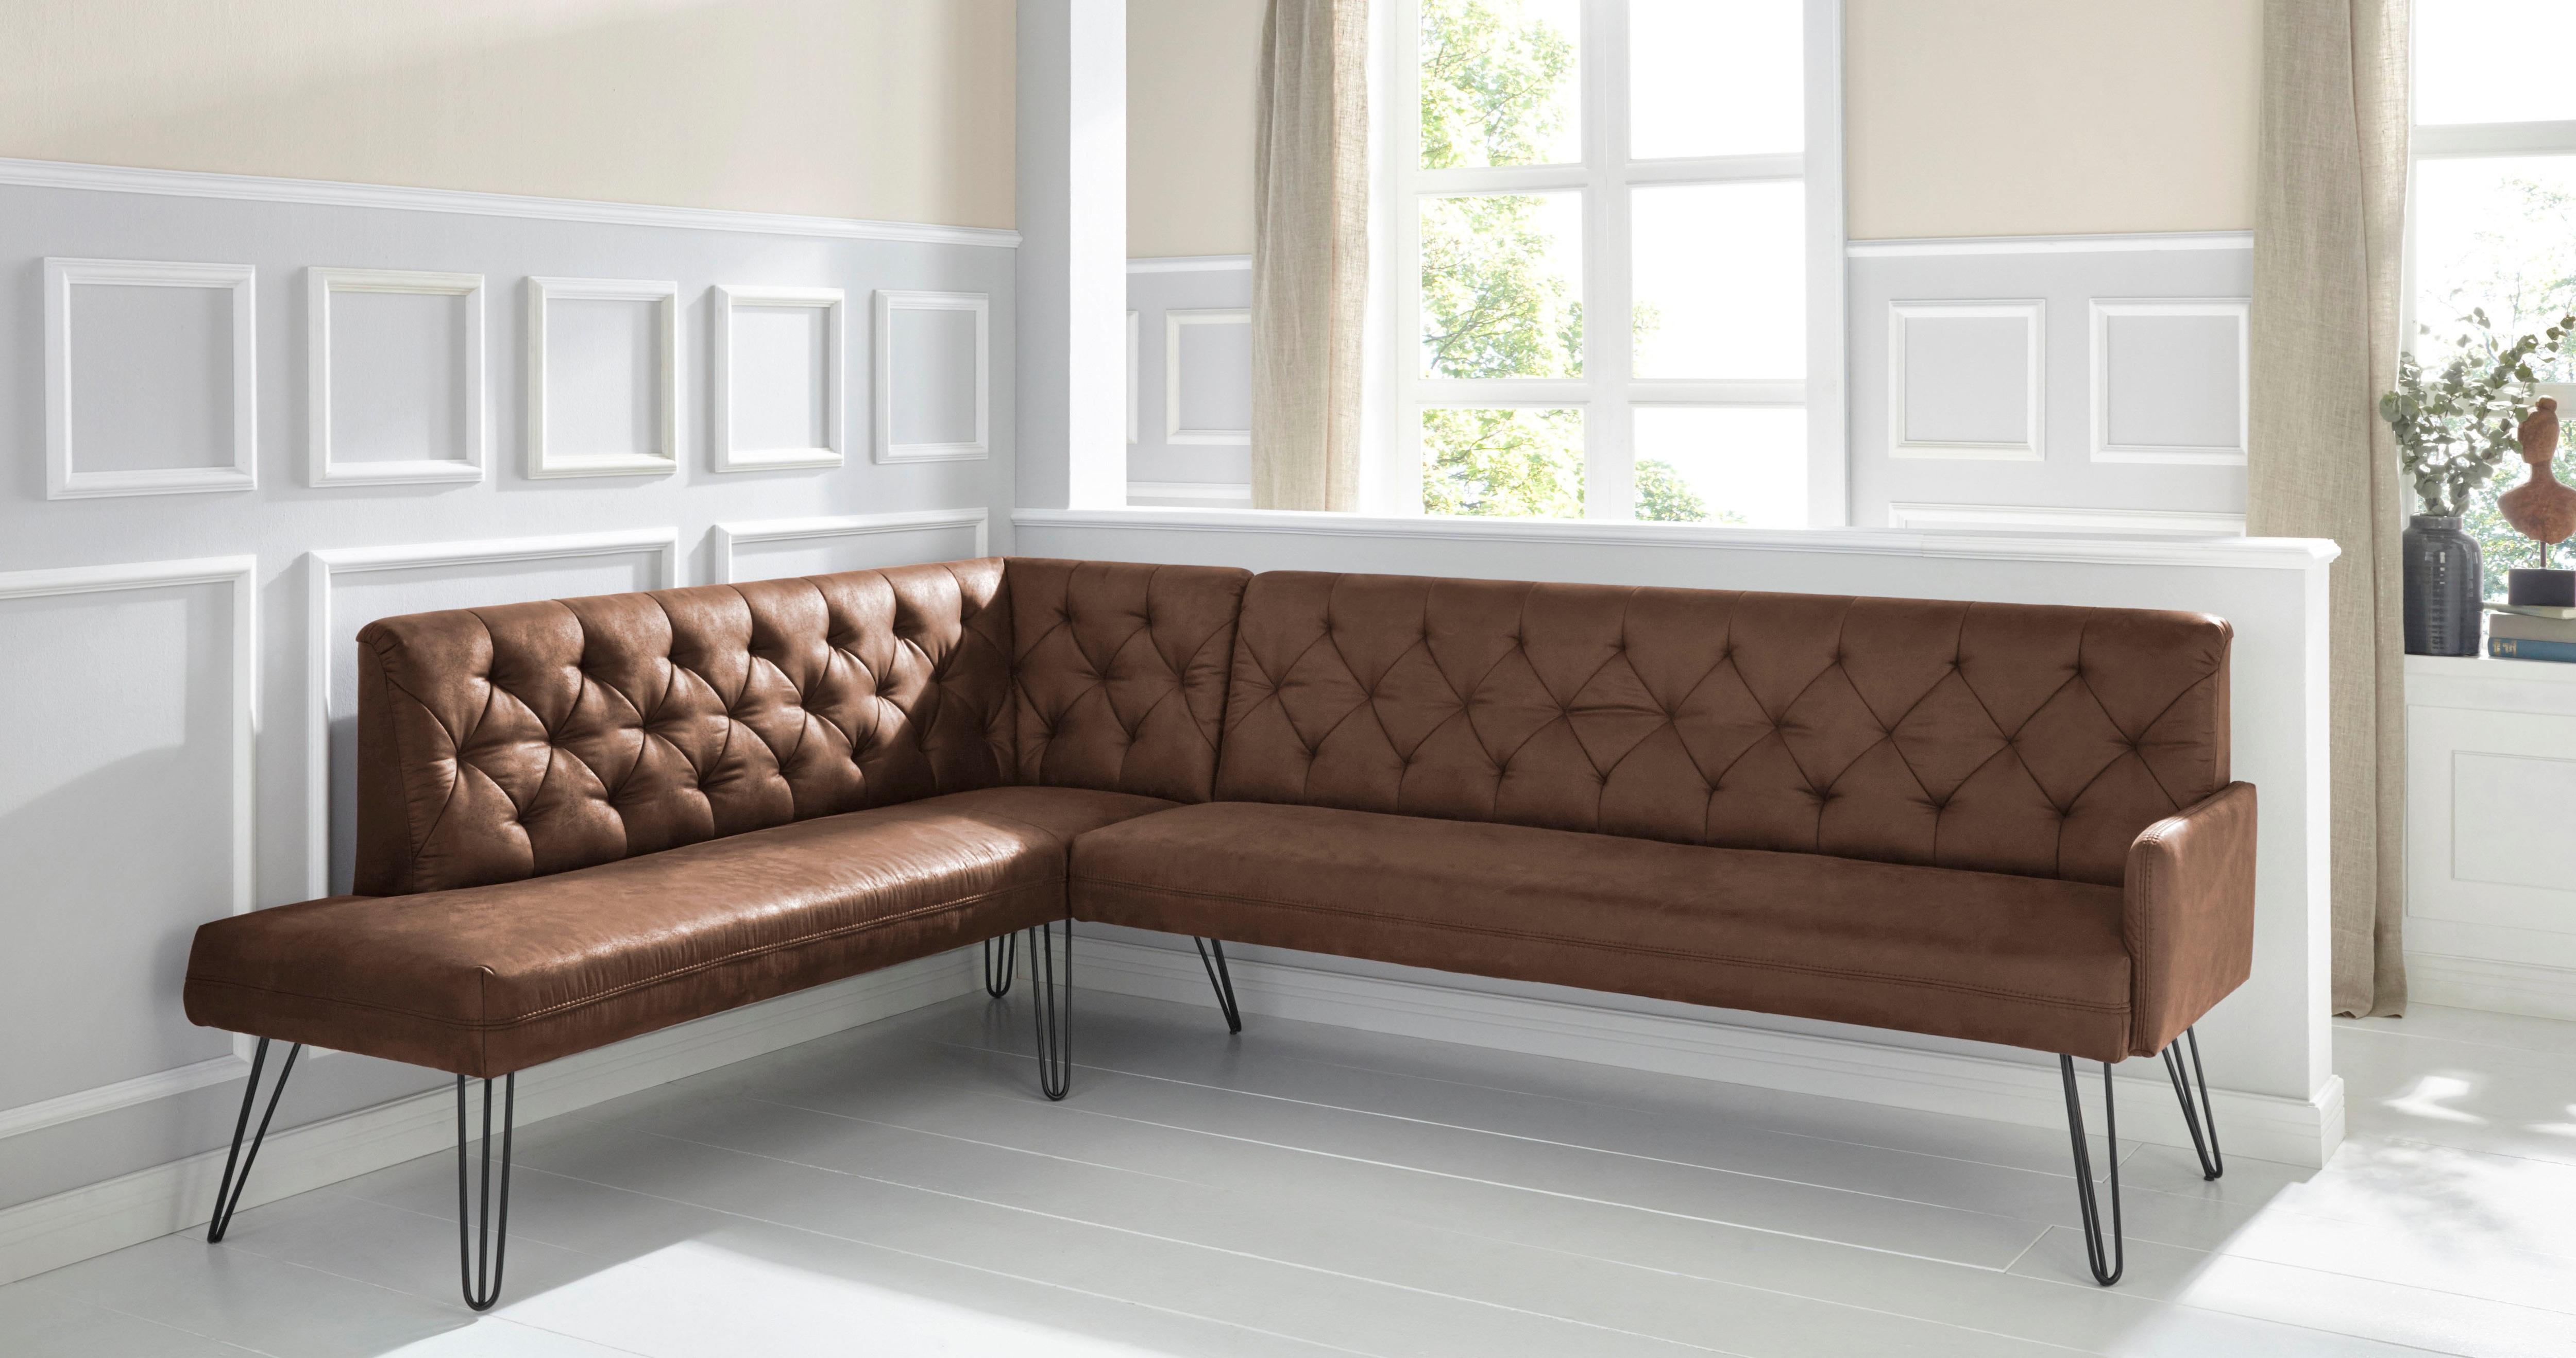 exxpo - sofa fashion Eckbank Doppio, Frei im Raum stellbar günstig online kaufen